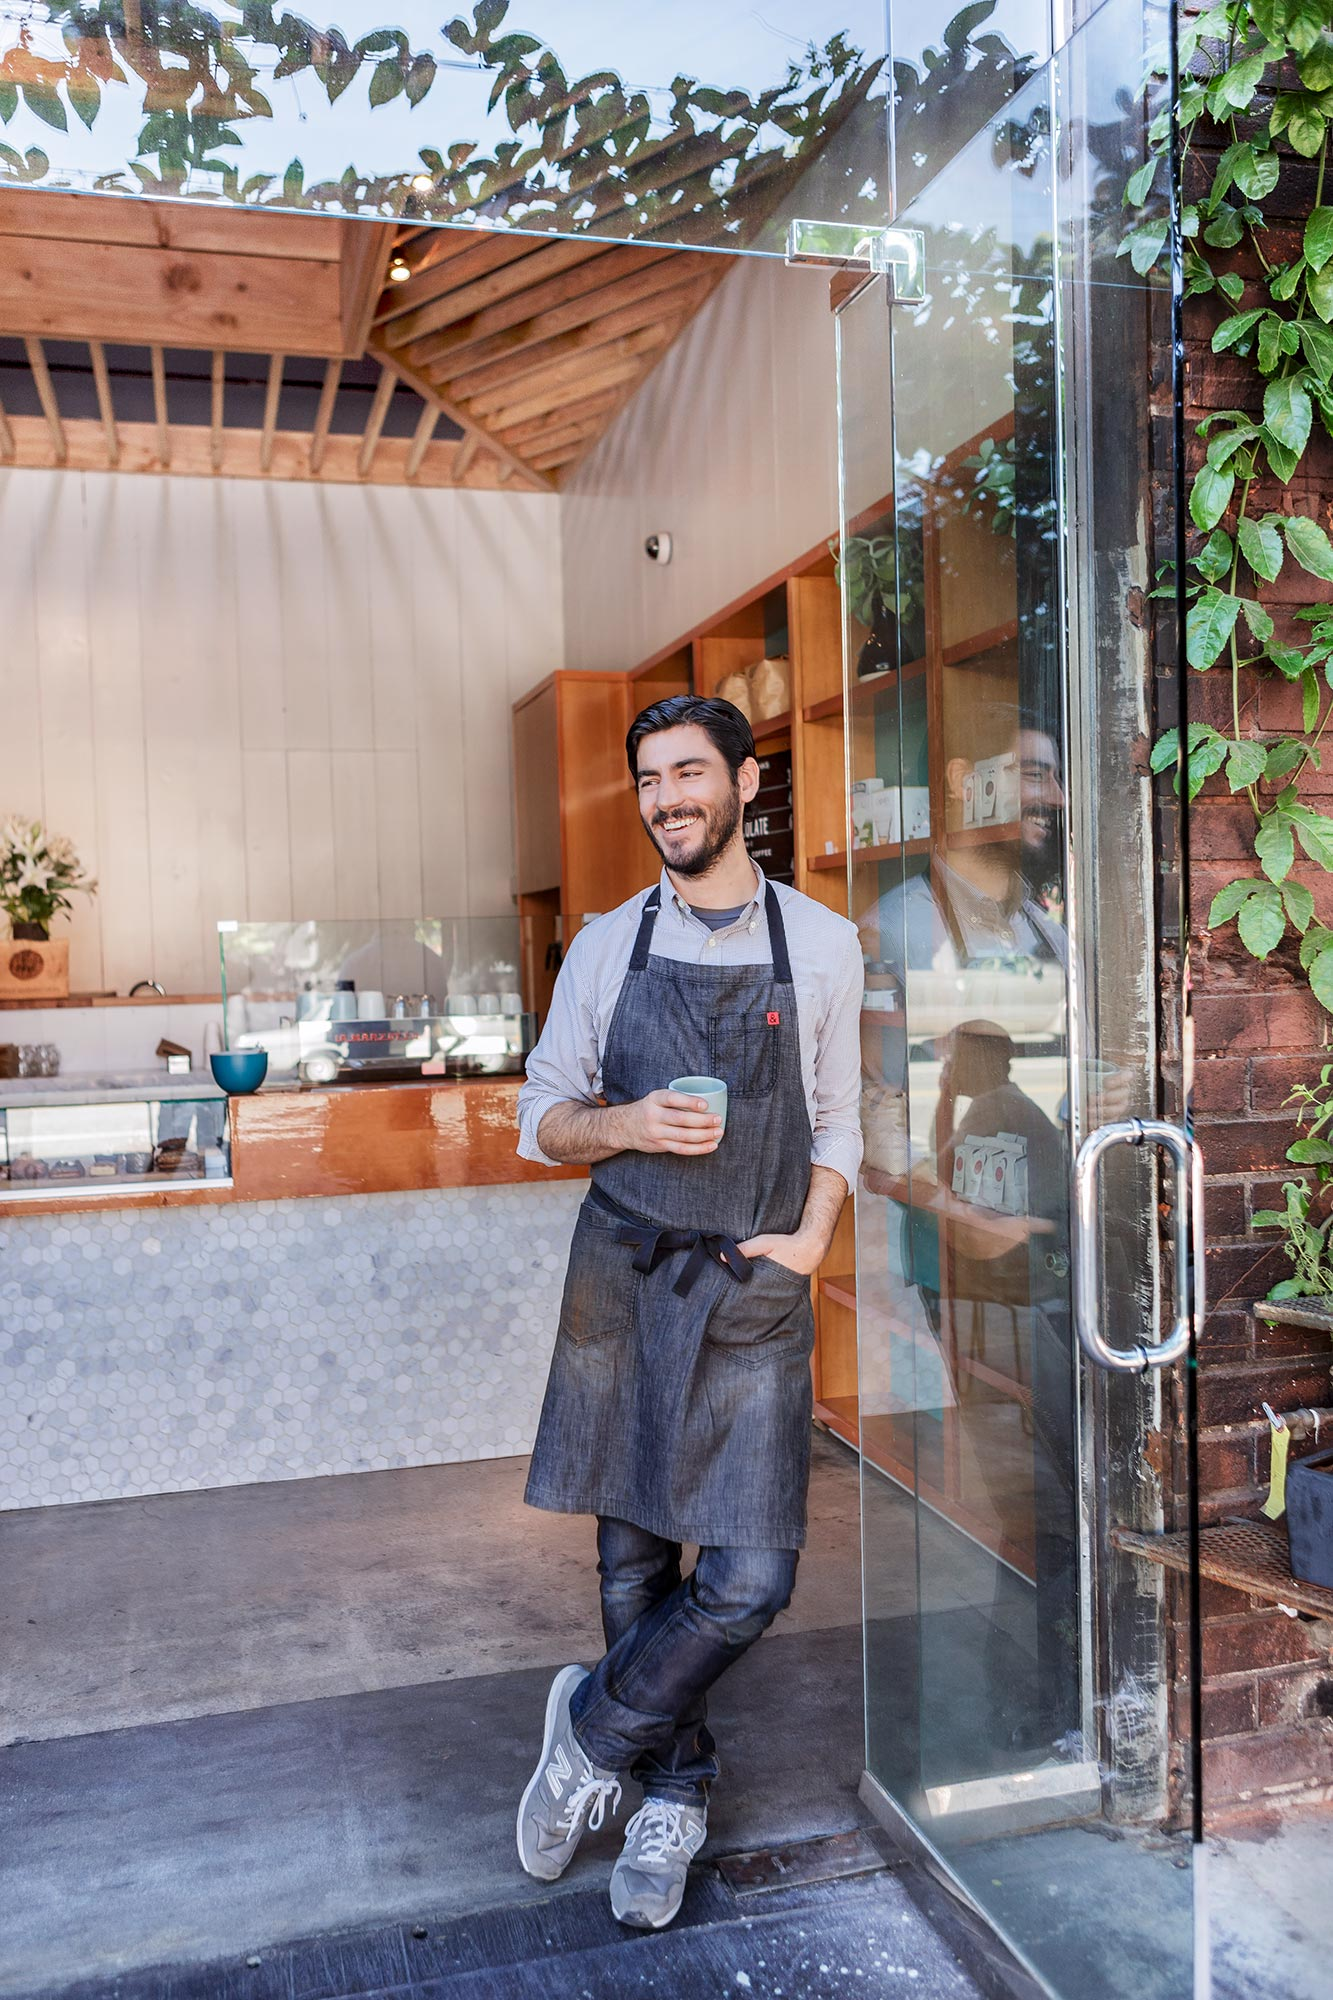 losangeles-artsdisctrict-coffeeshop-barista-shoes.jpg